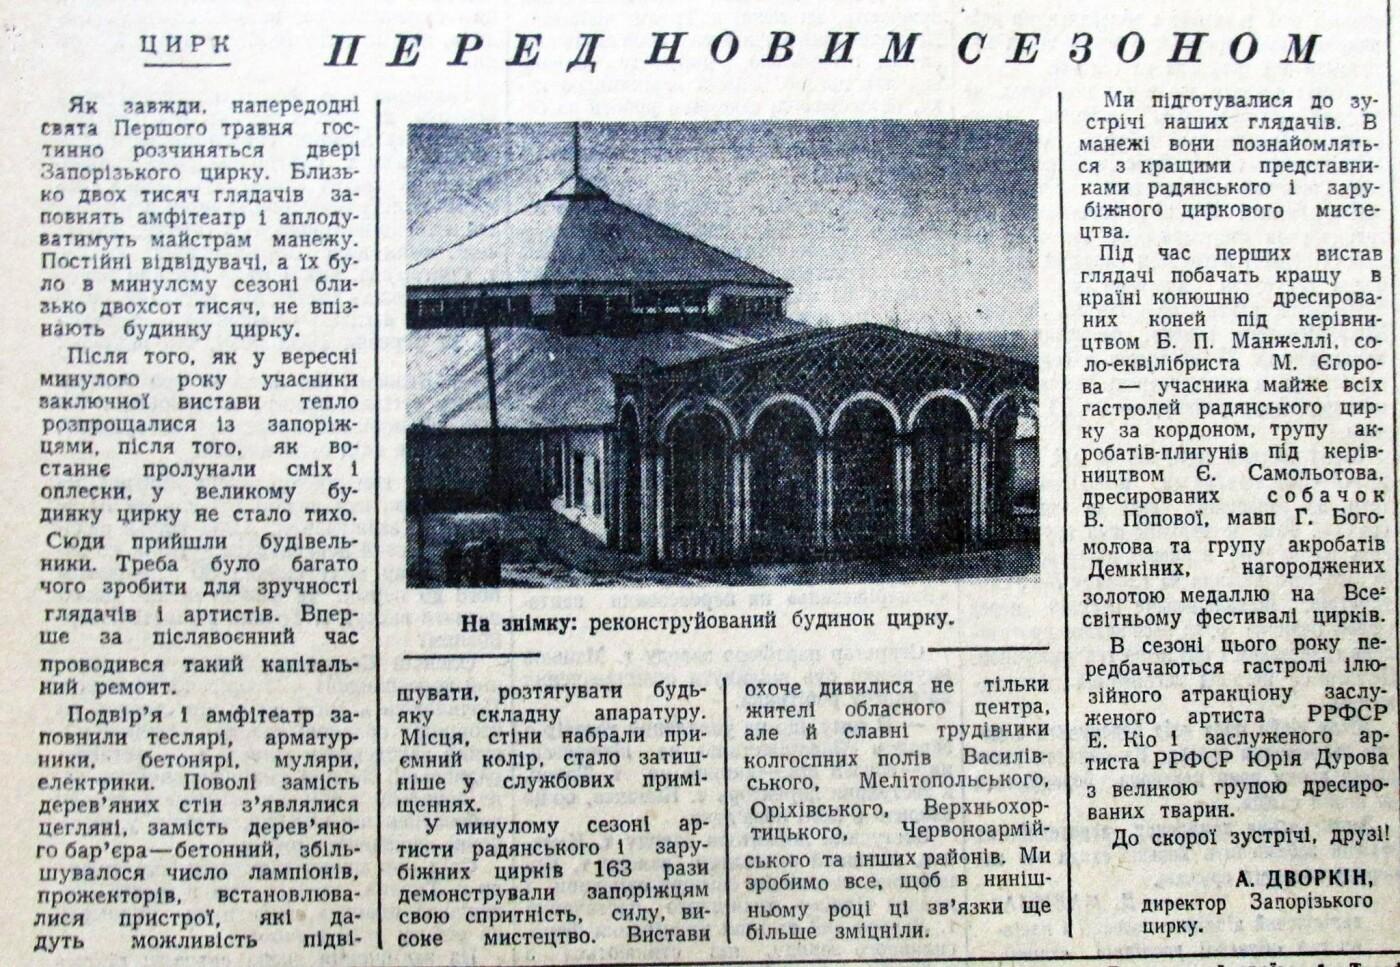 """Работали под самыми облаками"": как в Запорожье строили здание цирка, - ФОТО, фото-9"